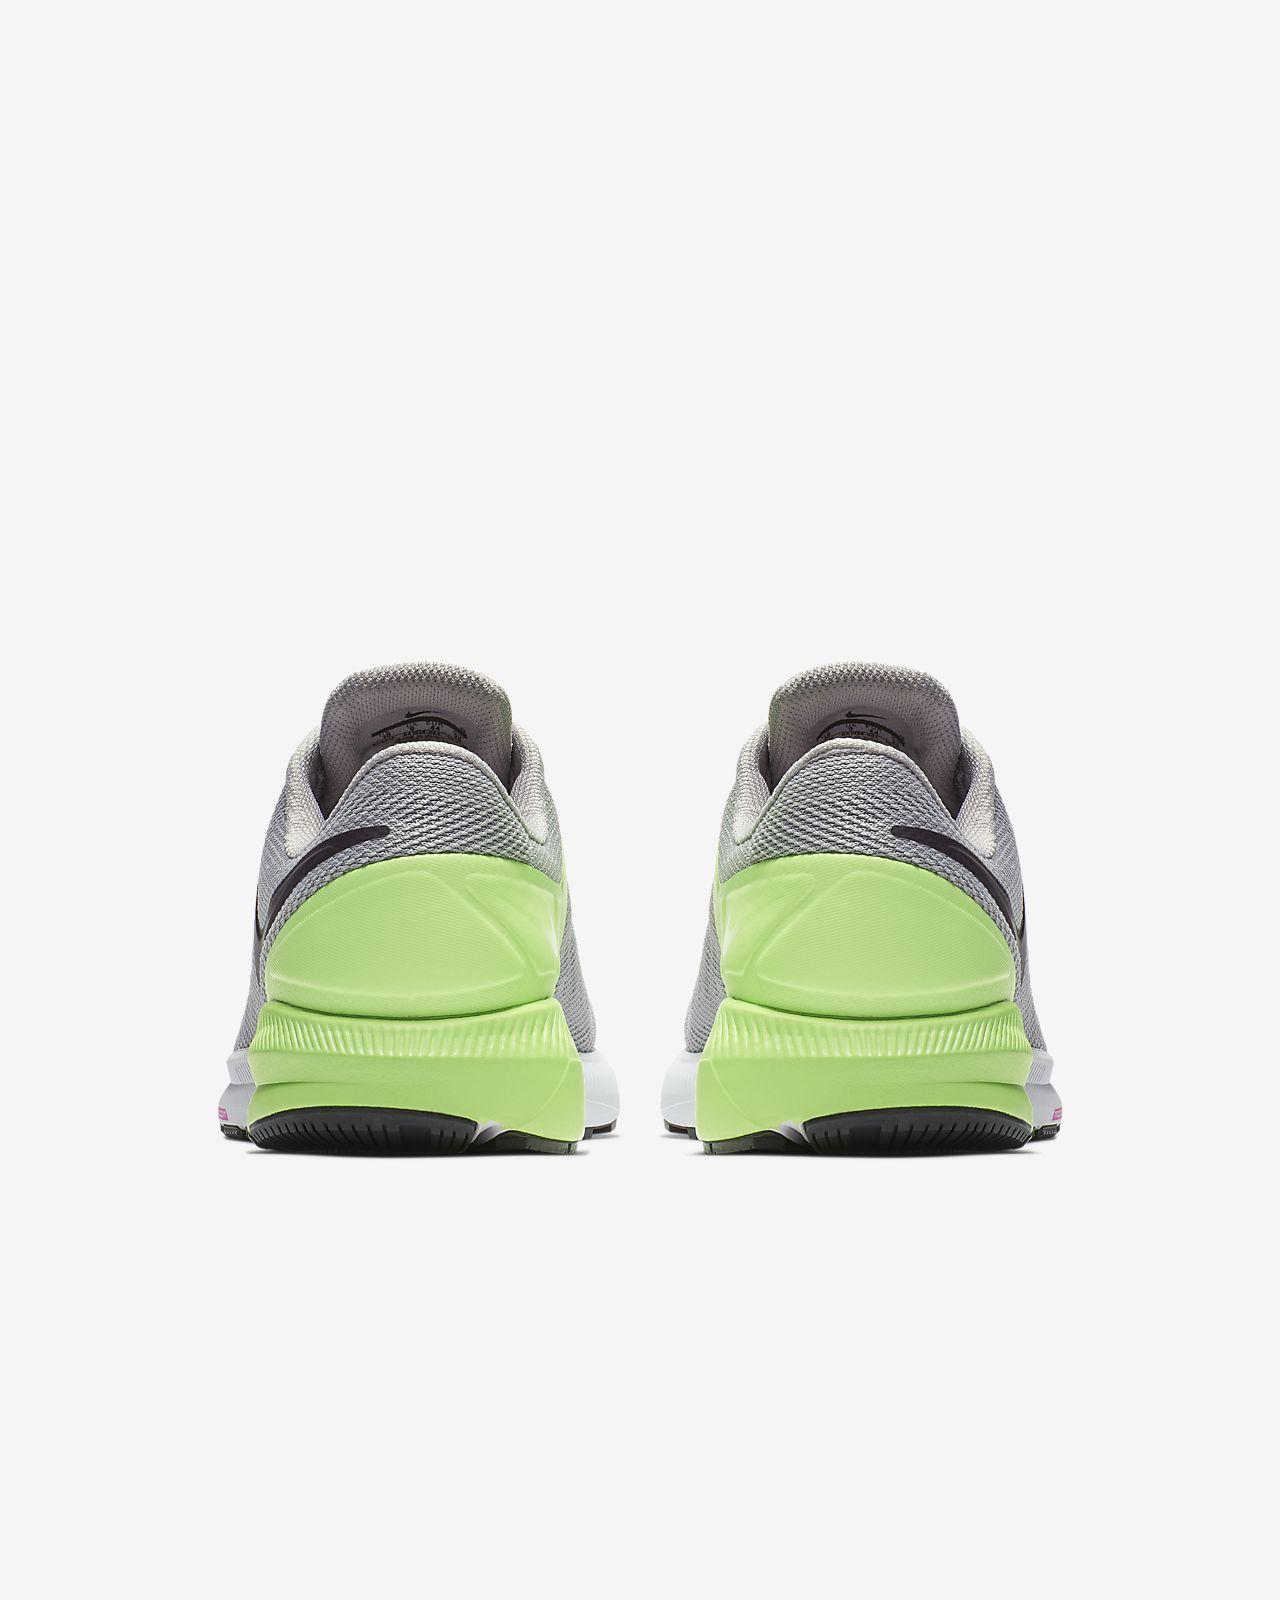 reputable site fa408 9e502 ... Löparsko Nike Air Zoom Structure 22 för män